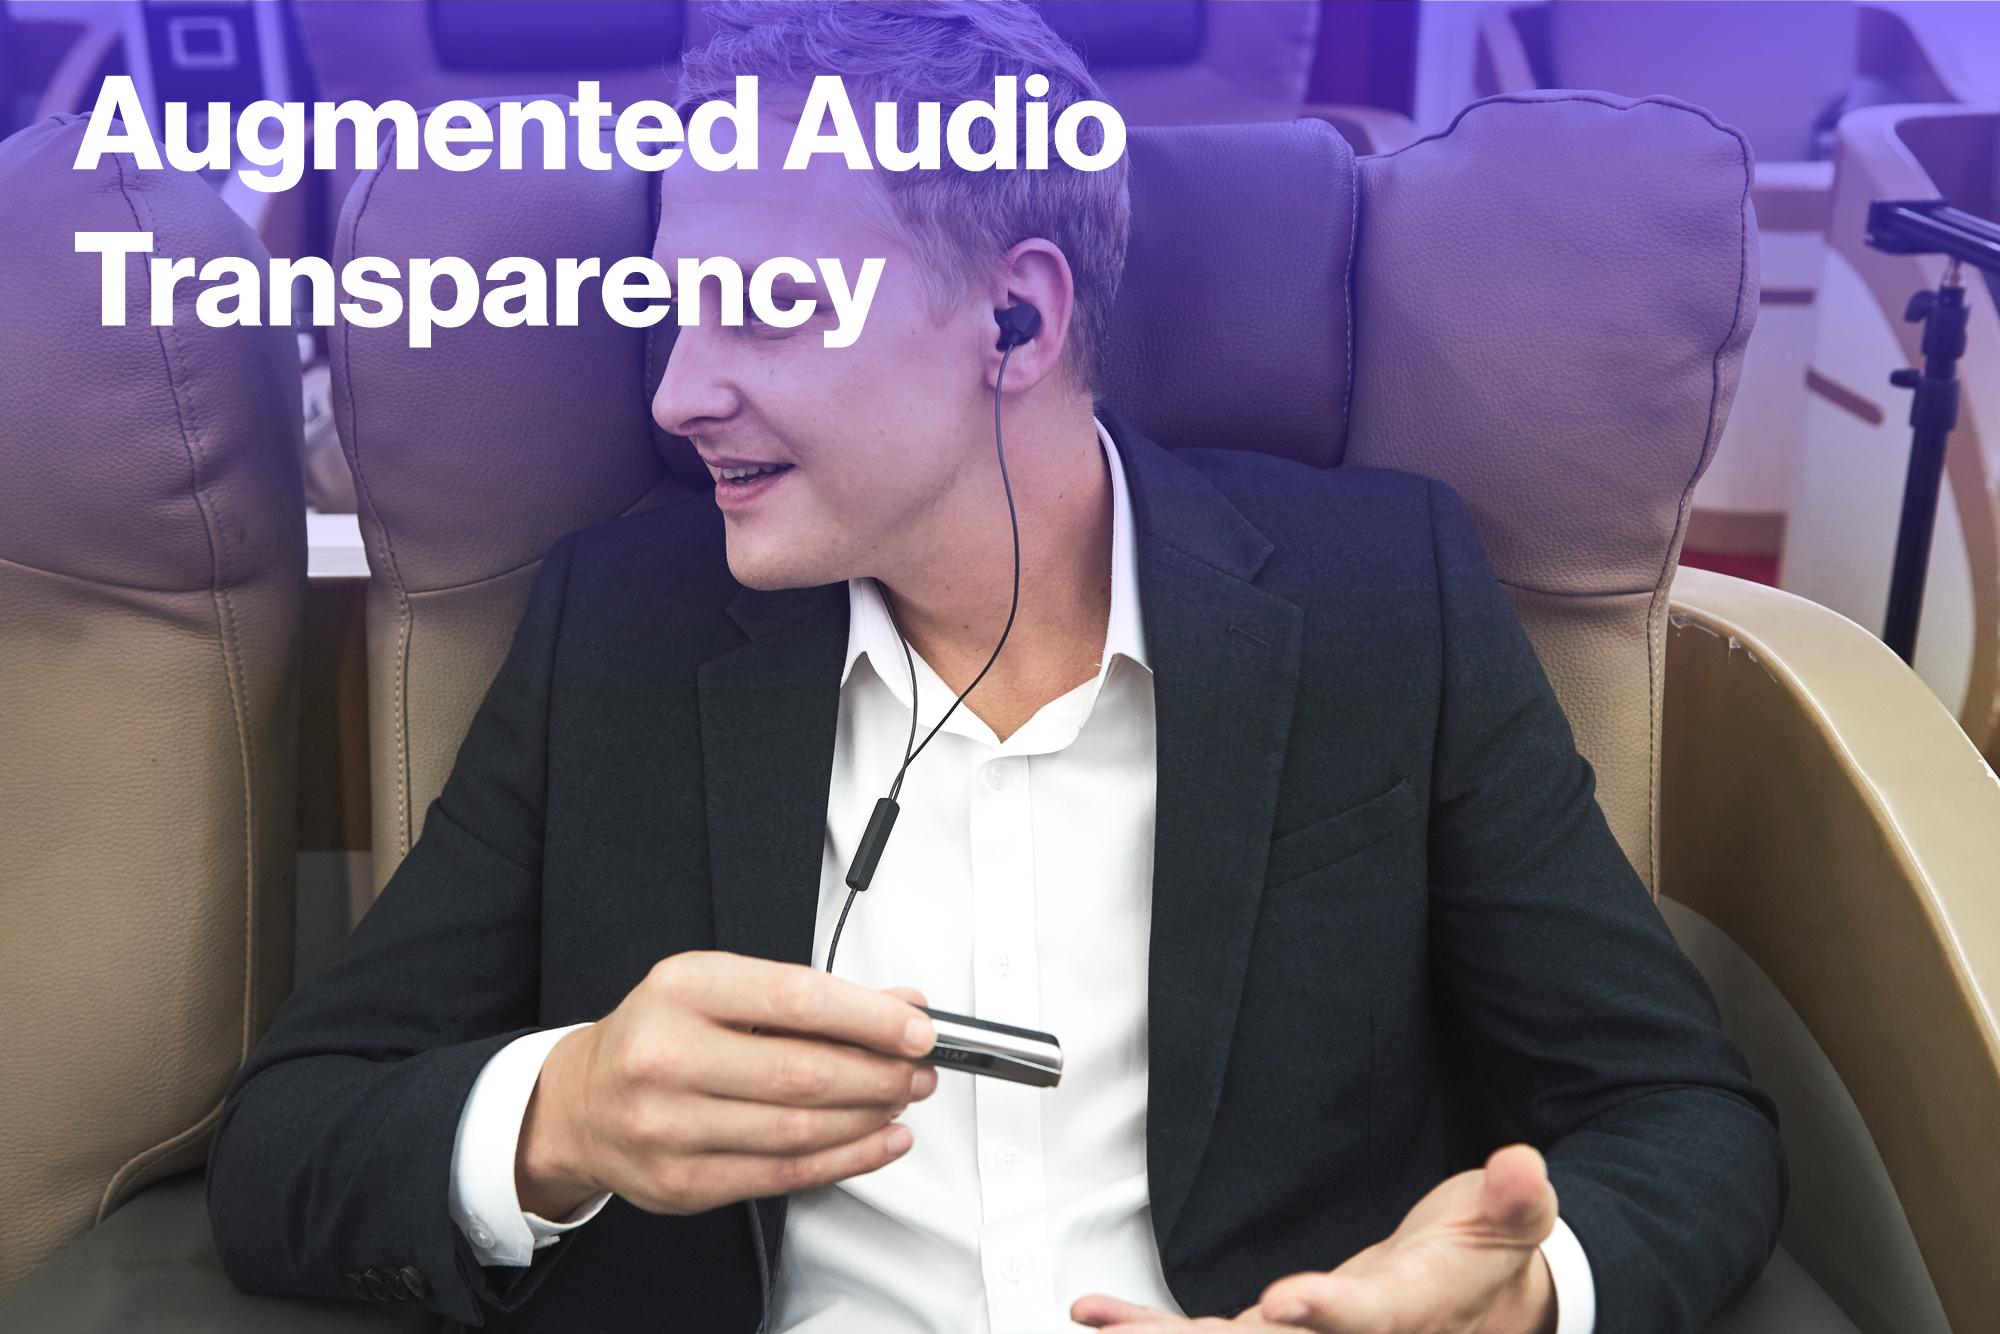 AugmentedAudioTransparency.jpg